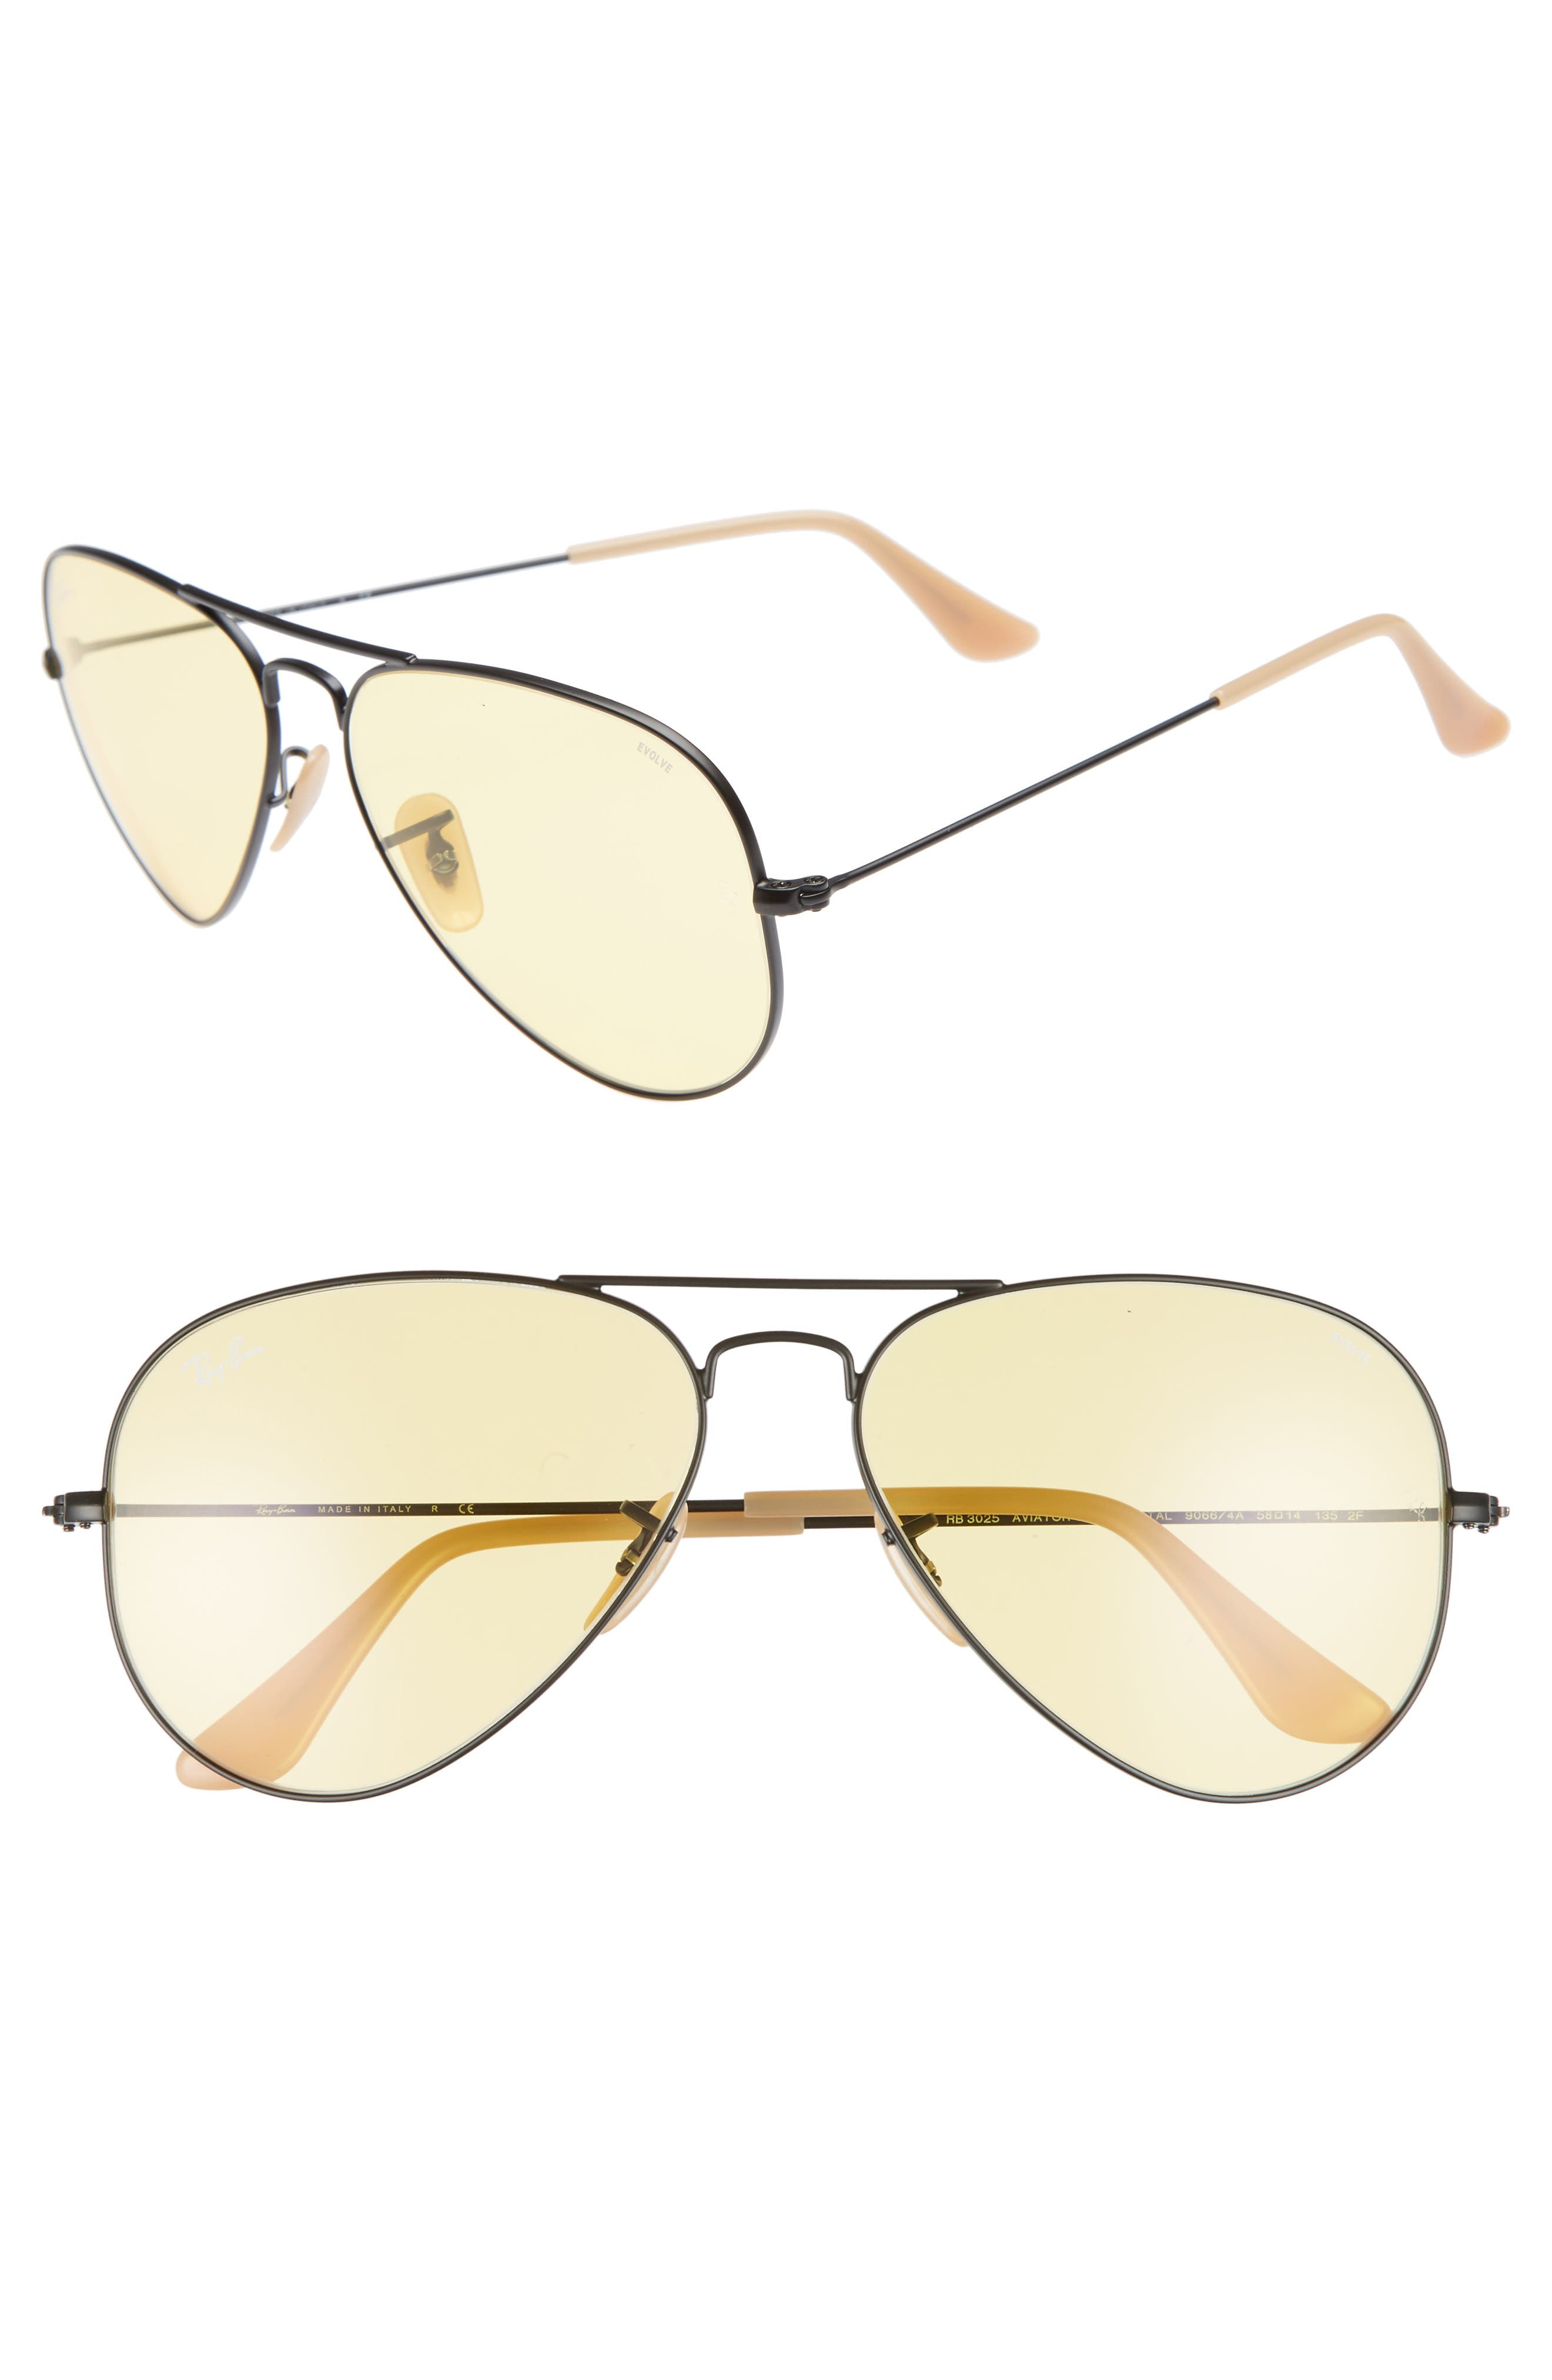 a3e64fd8d28 ... cheapest ray ban evolve 58mm polarized aviator sunglasses nordstrom  5b3d0 84b0b